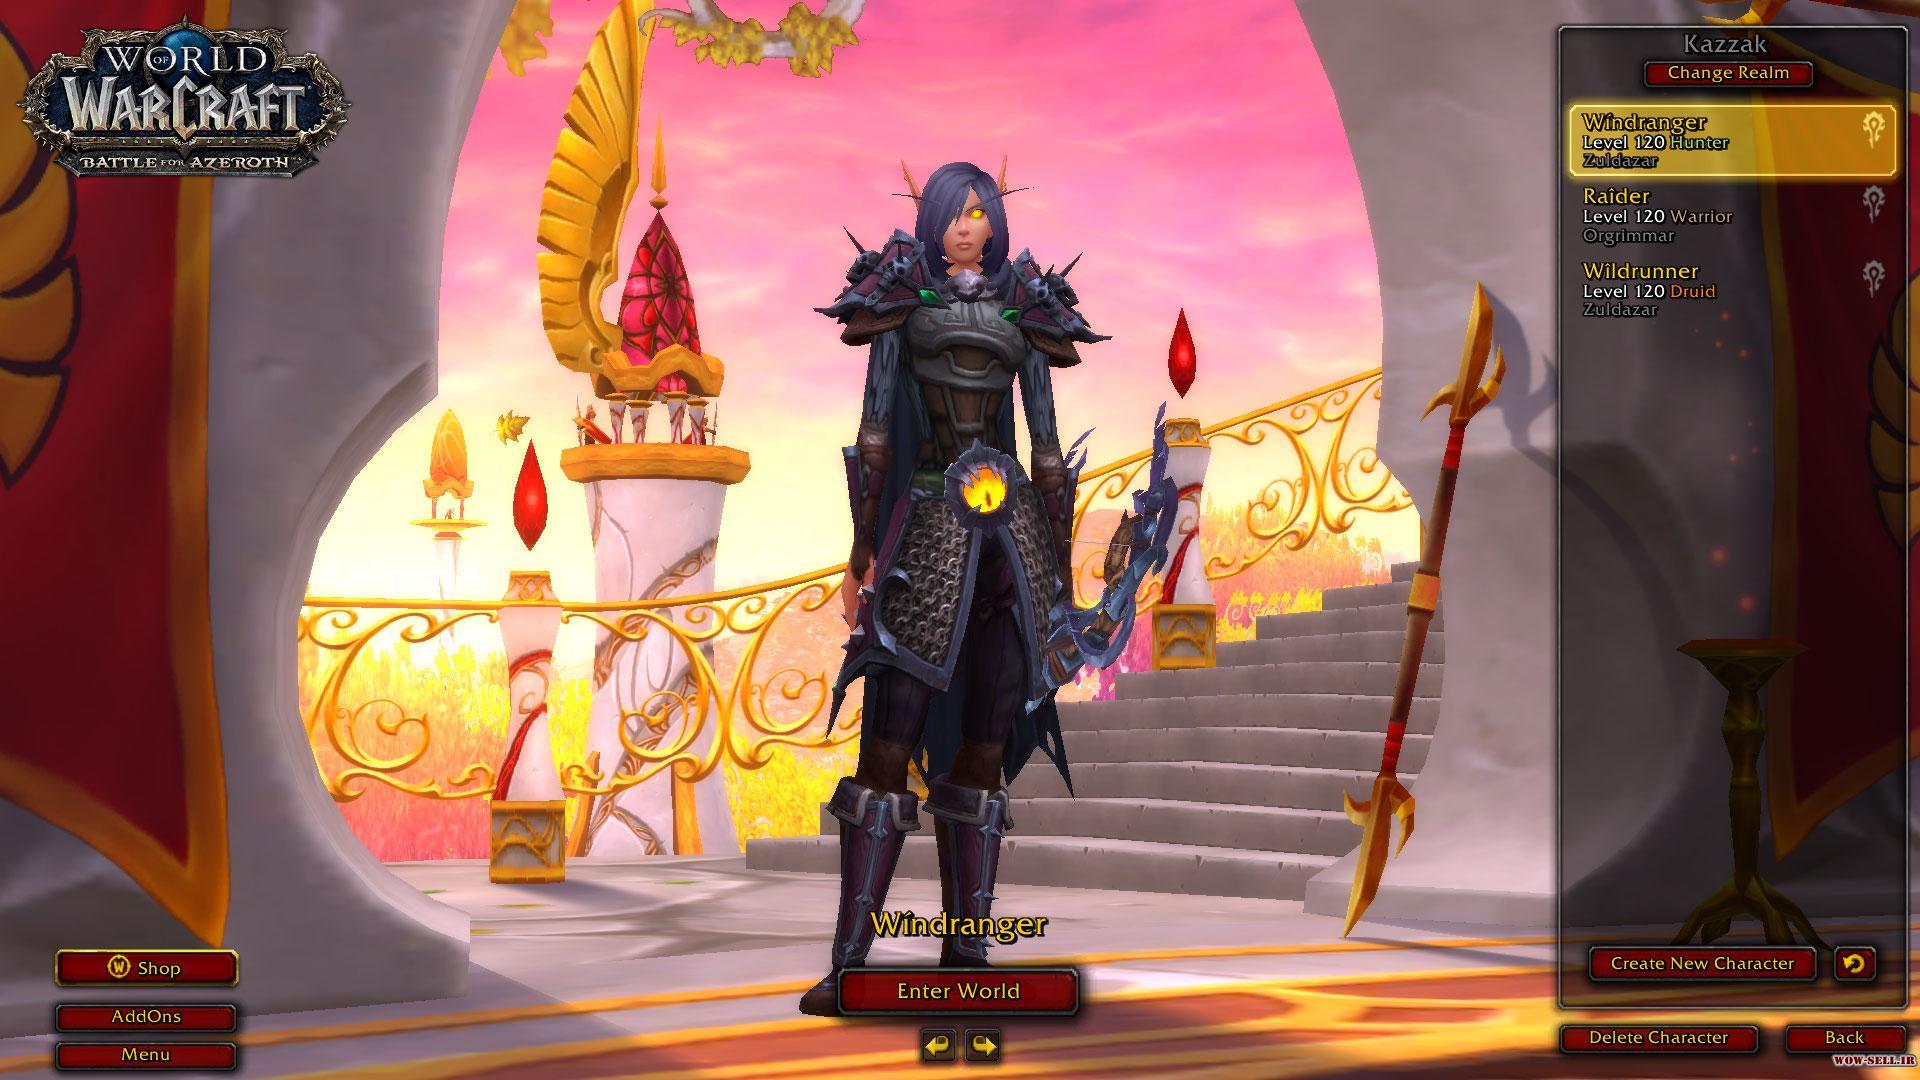 🔴 فروخته شد 🔴 - فروش اکانت wow - کد 1128 - کلاس Hunter + warrior + druid - سرور Battle.net